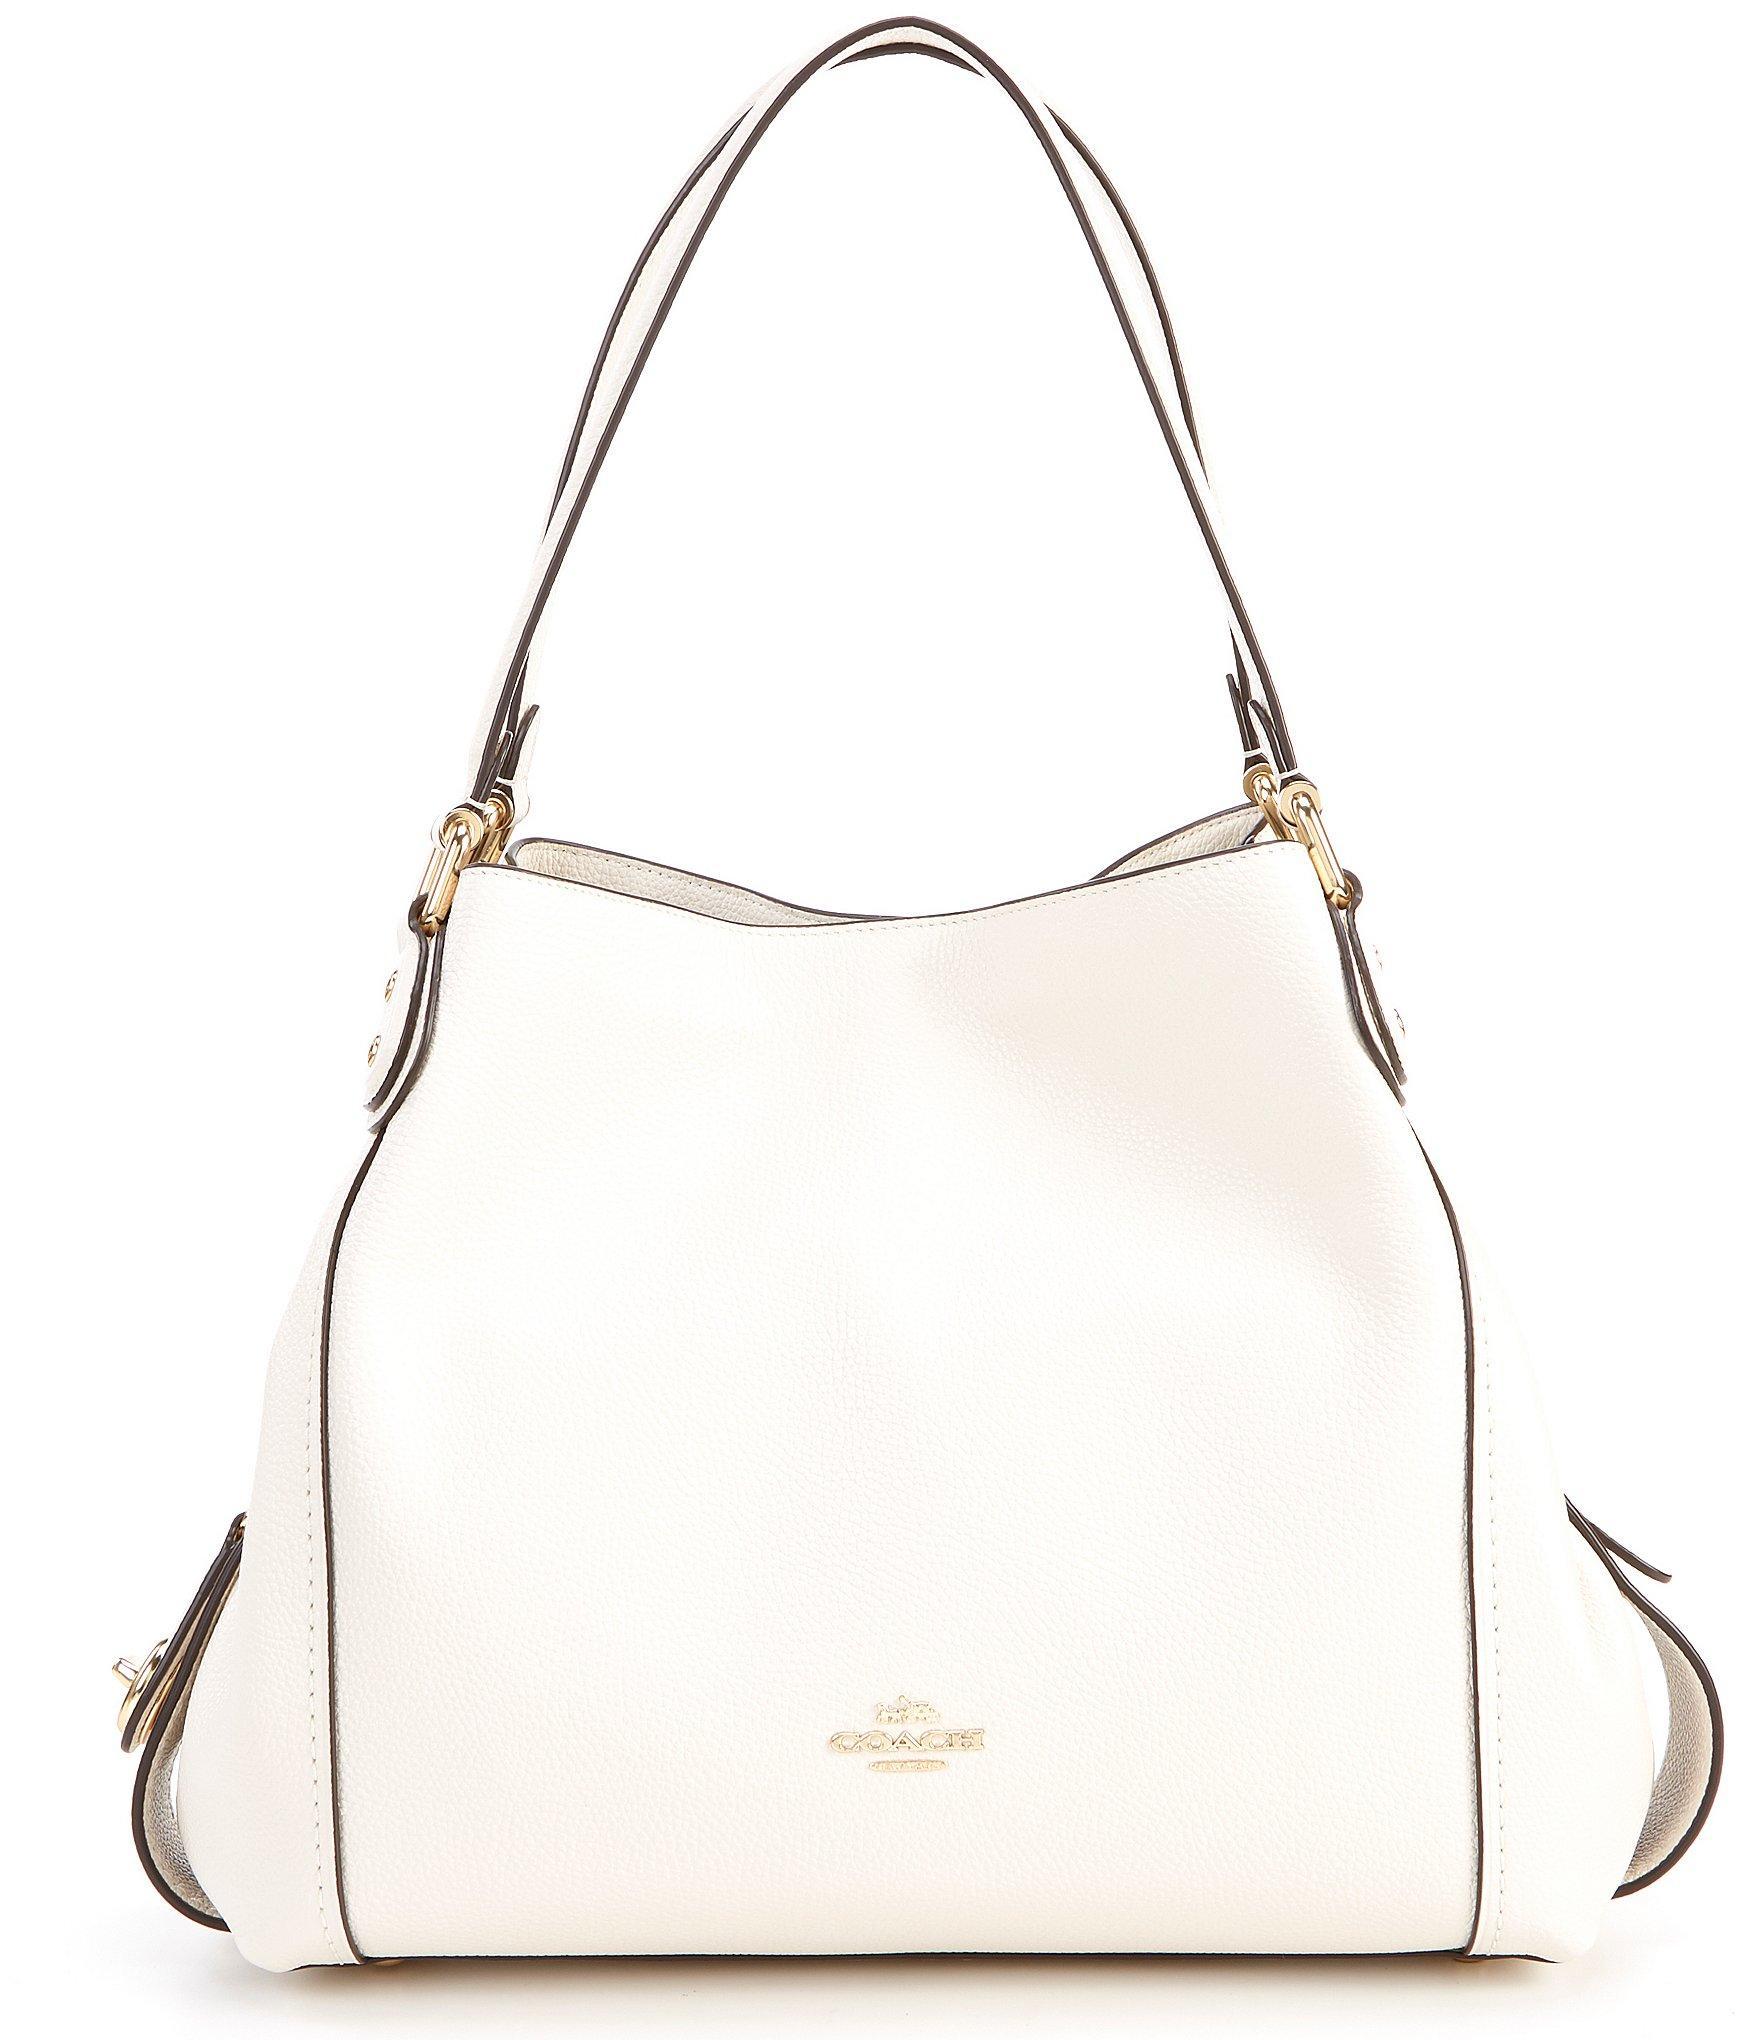 e95618ba0f95 COACH. Women s Edie 31 Polished Pebble Shoulder Bag